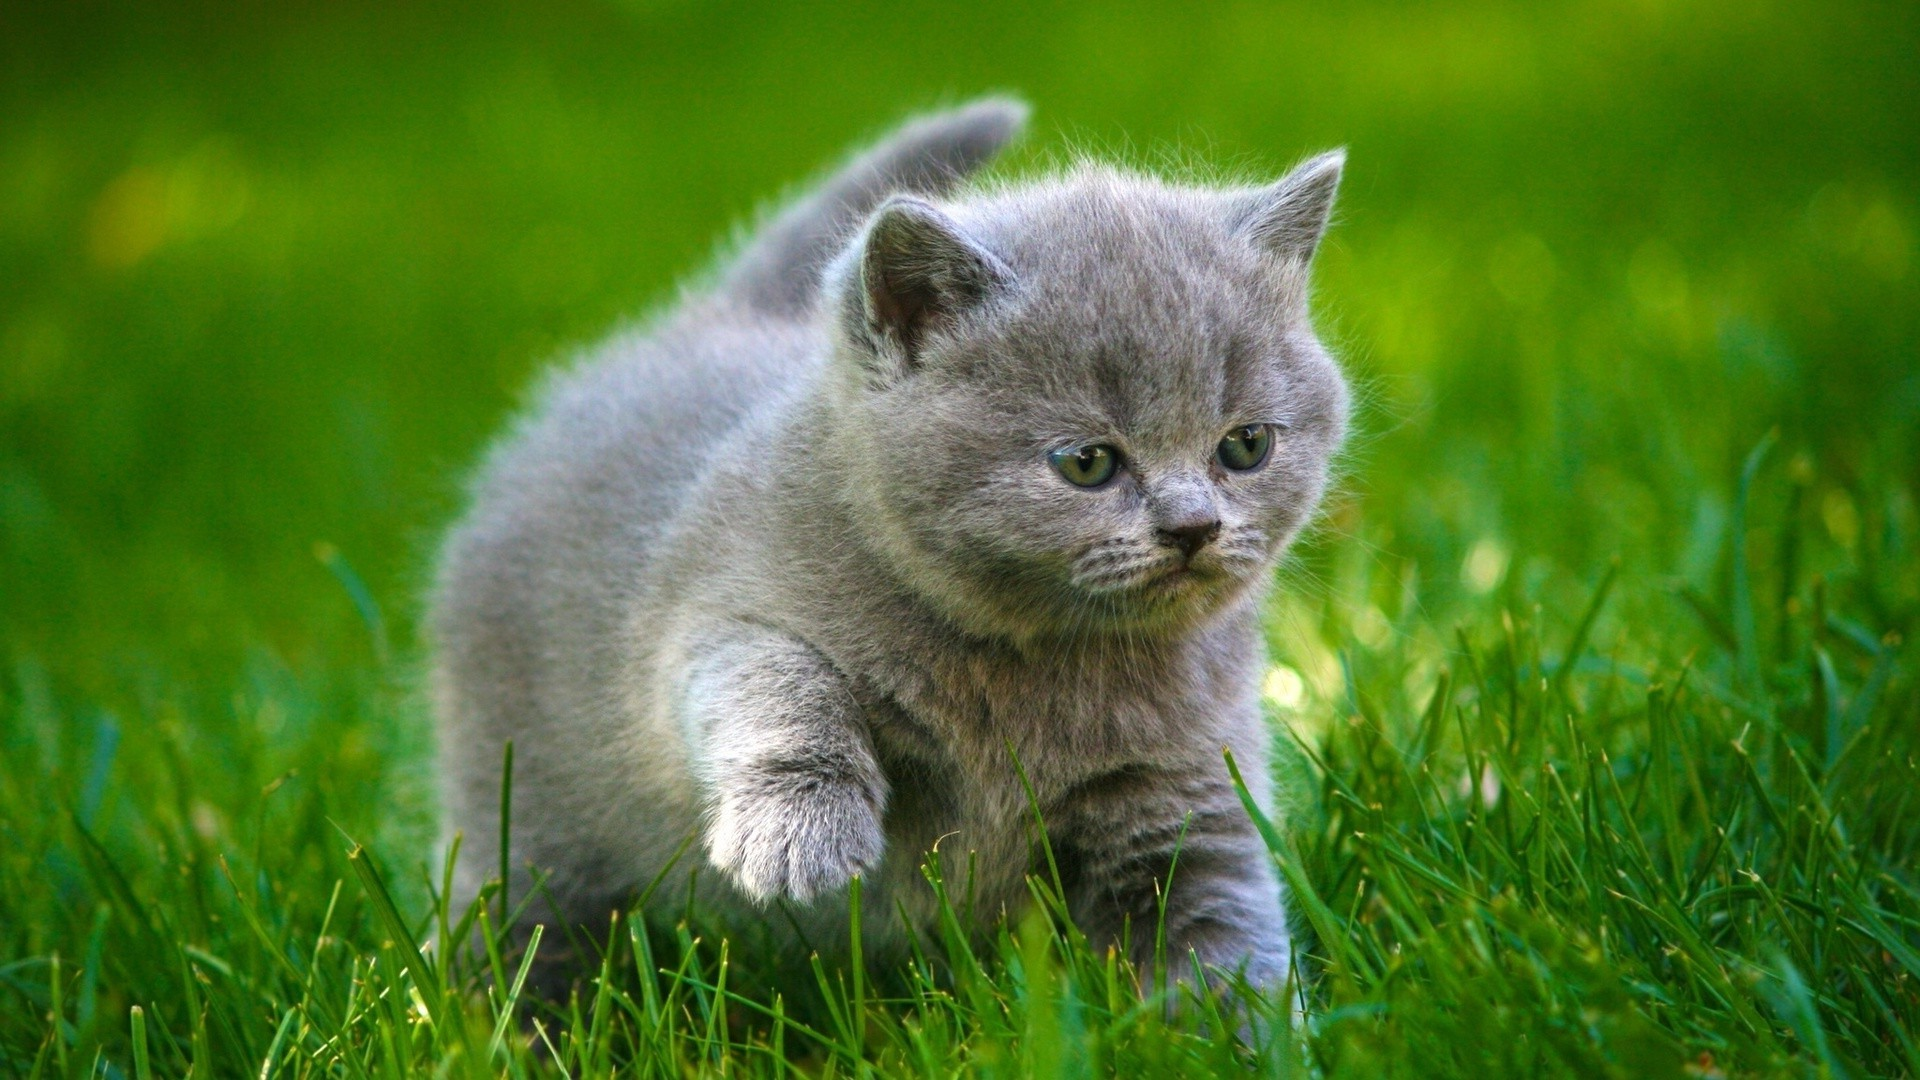 grey kitten wallpaper 294 - photo #6